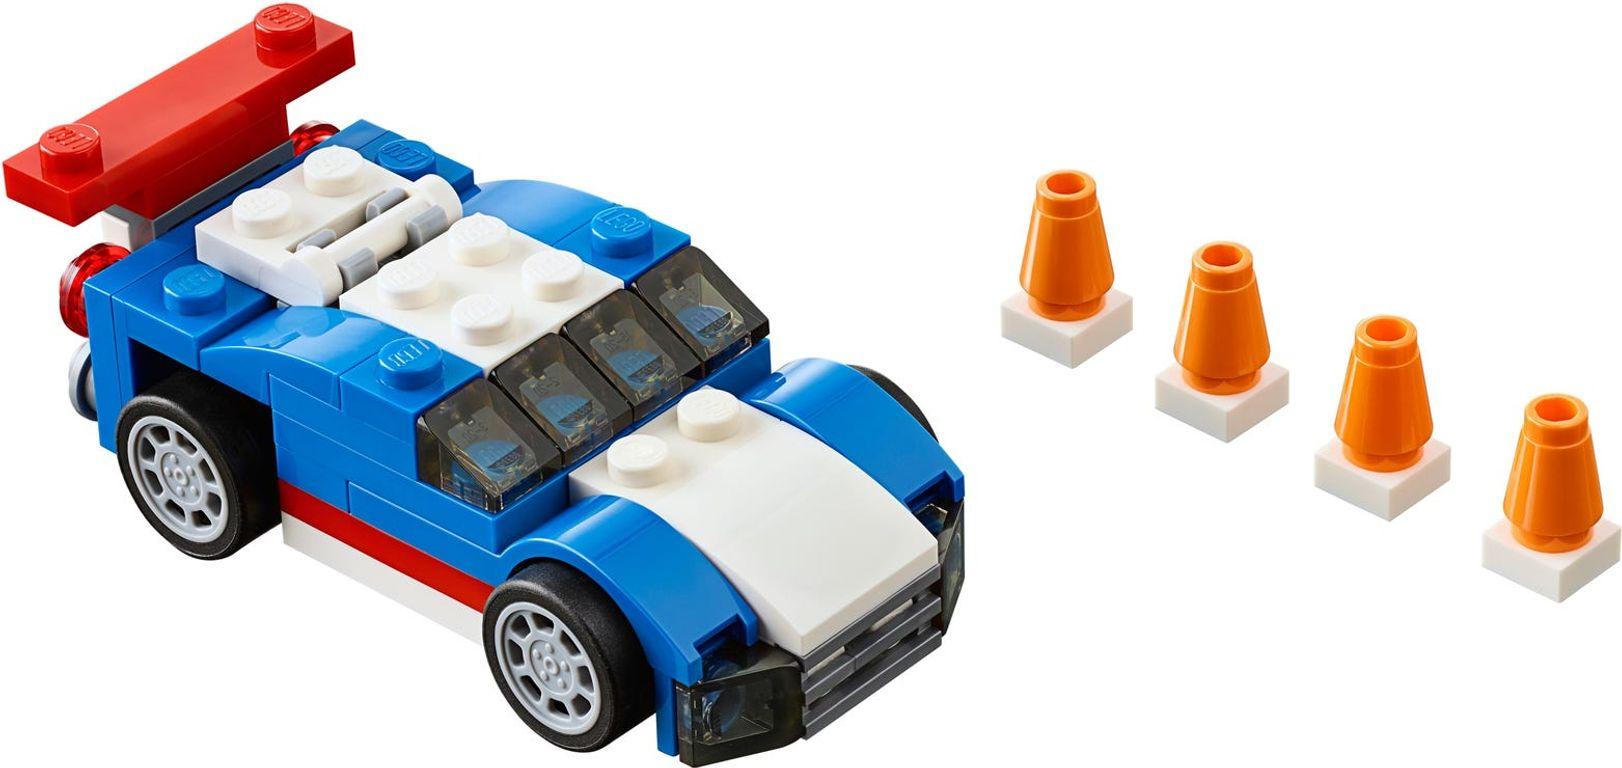 Blue Racer components